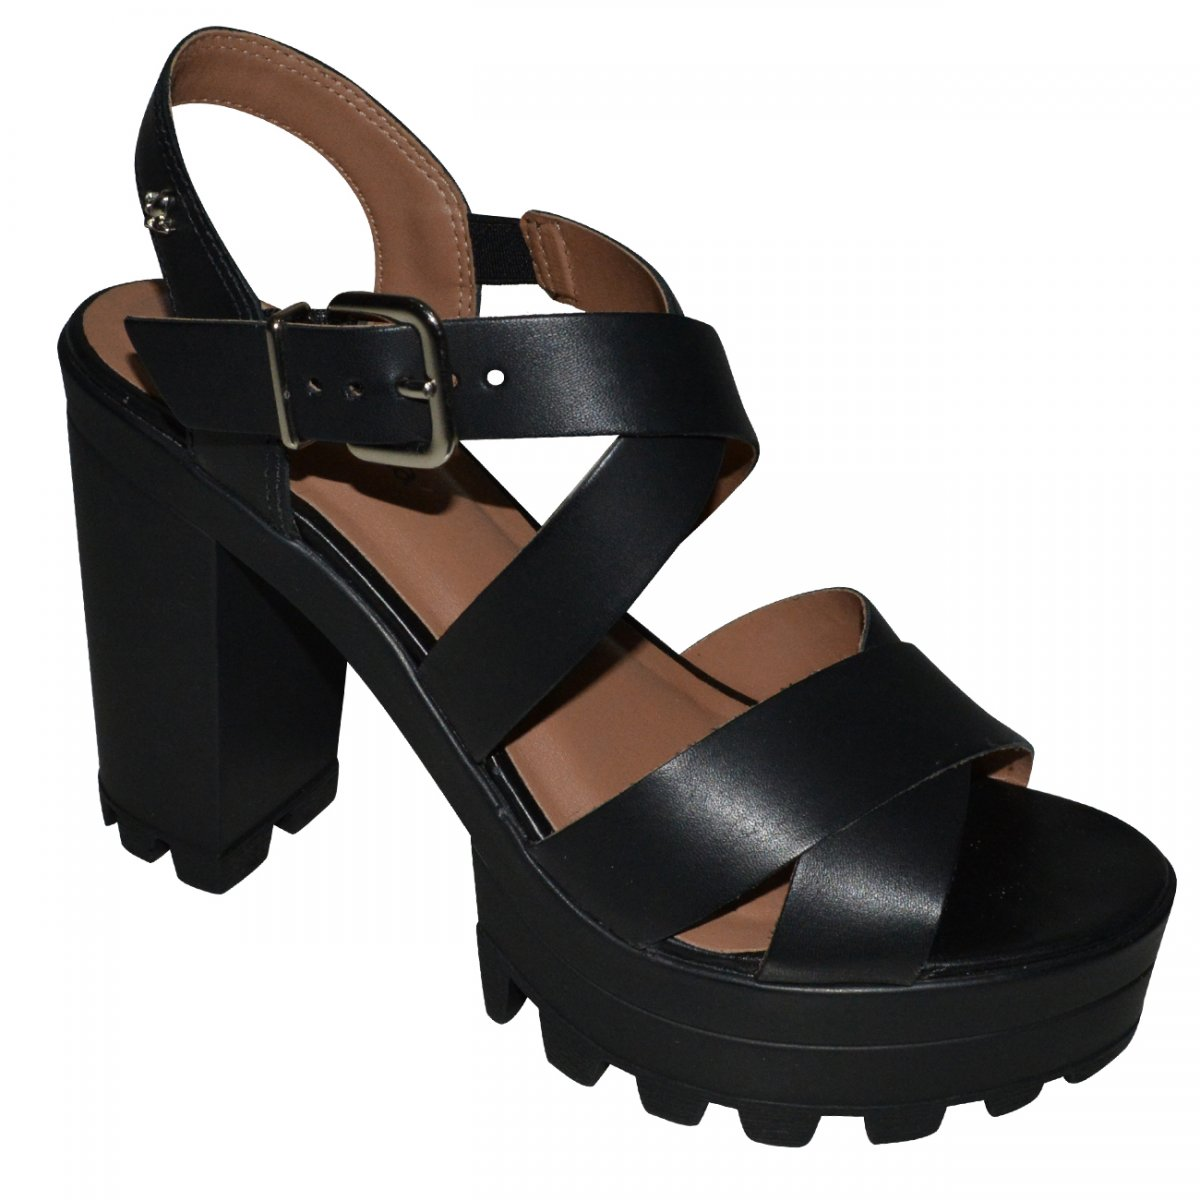 9136baf0e comprar sandalia cravo e canela, sandalia cravo e canela tratorada, sandalia  cravo e canela 2017, sandalia feminina da cravo